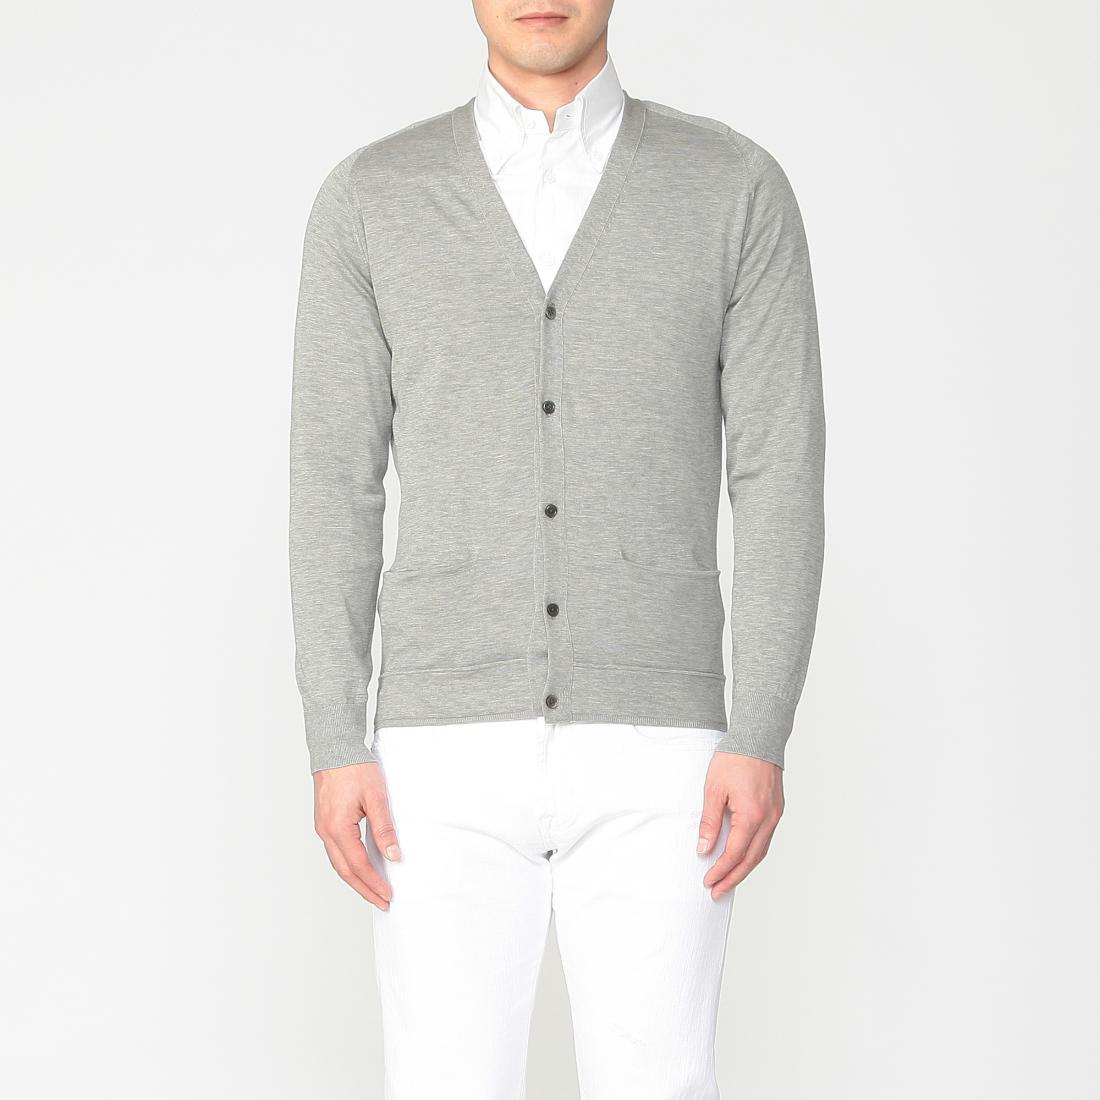 Cotton Silk Cardigan 1214448: Grey